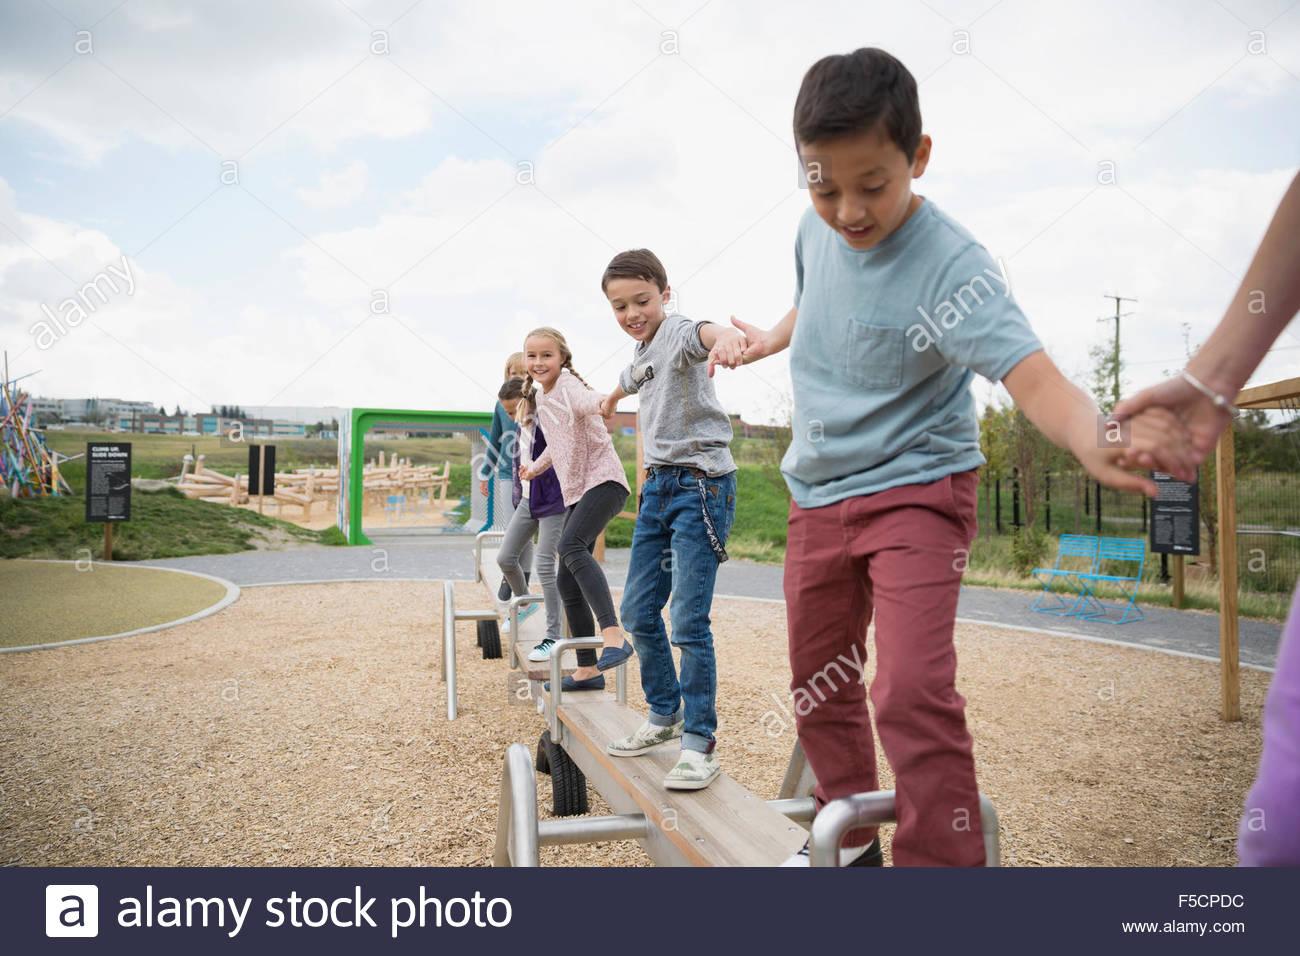 Kids balancing on long seesaw at playground - Stock Image